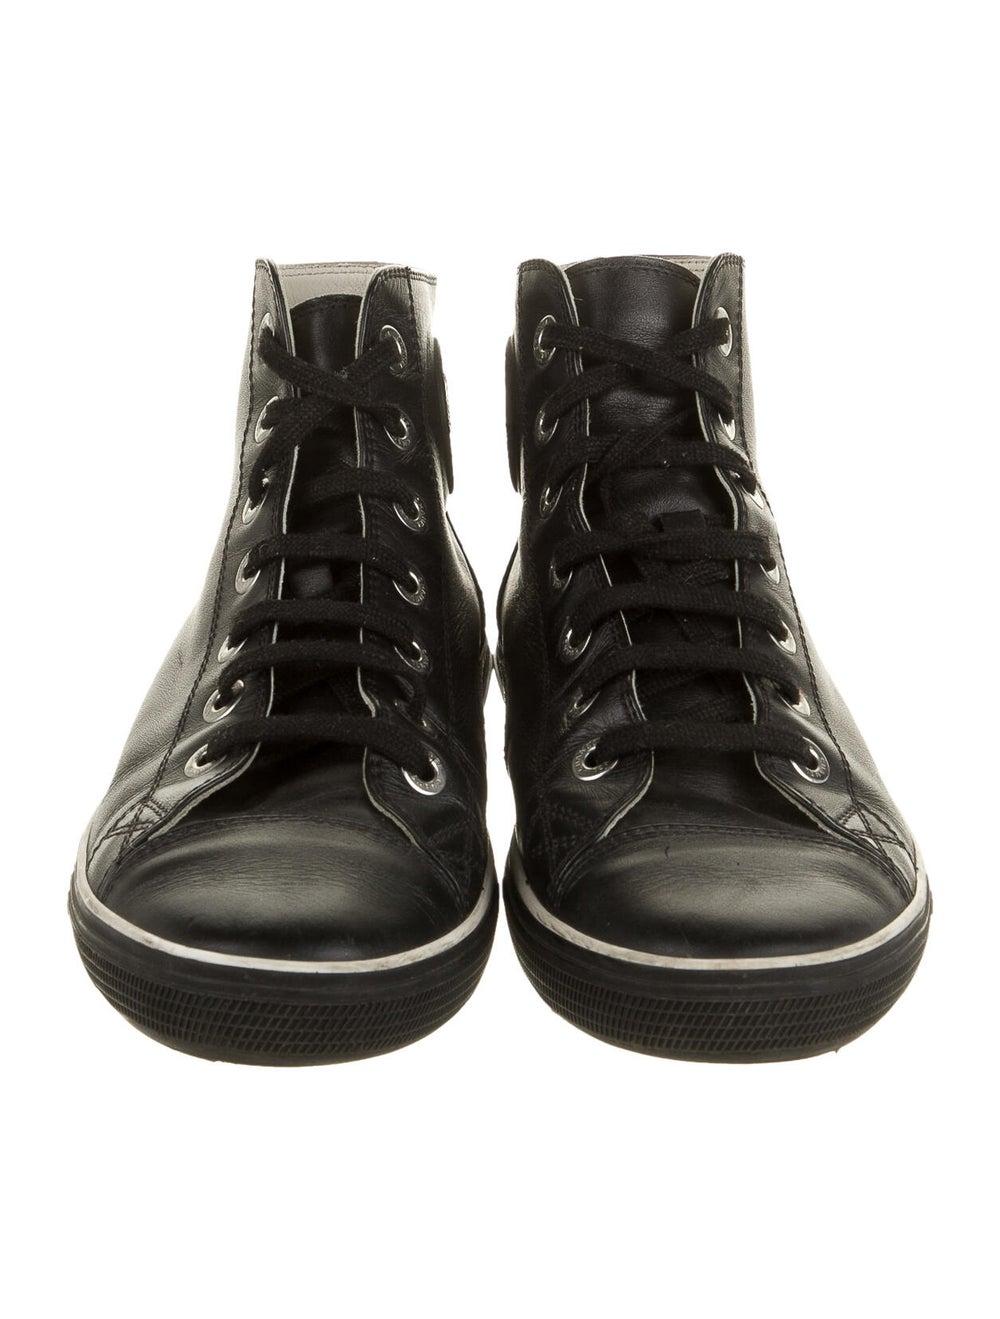 Chanel Interlocking CC Logo Leather Sneakers Black - image 3